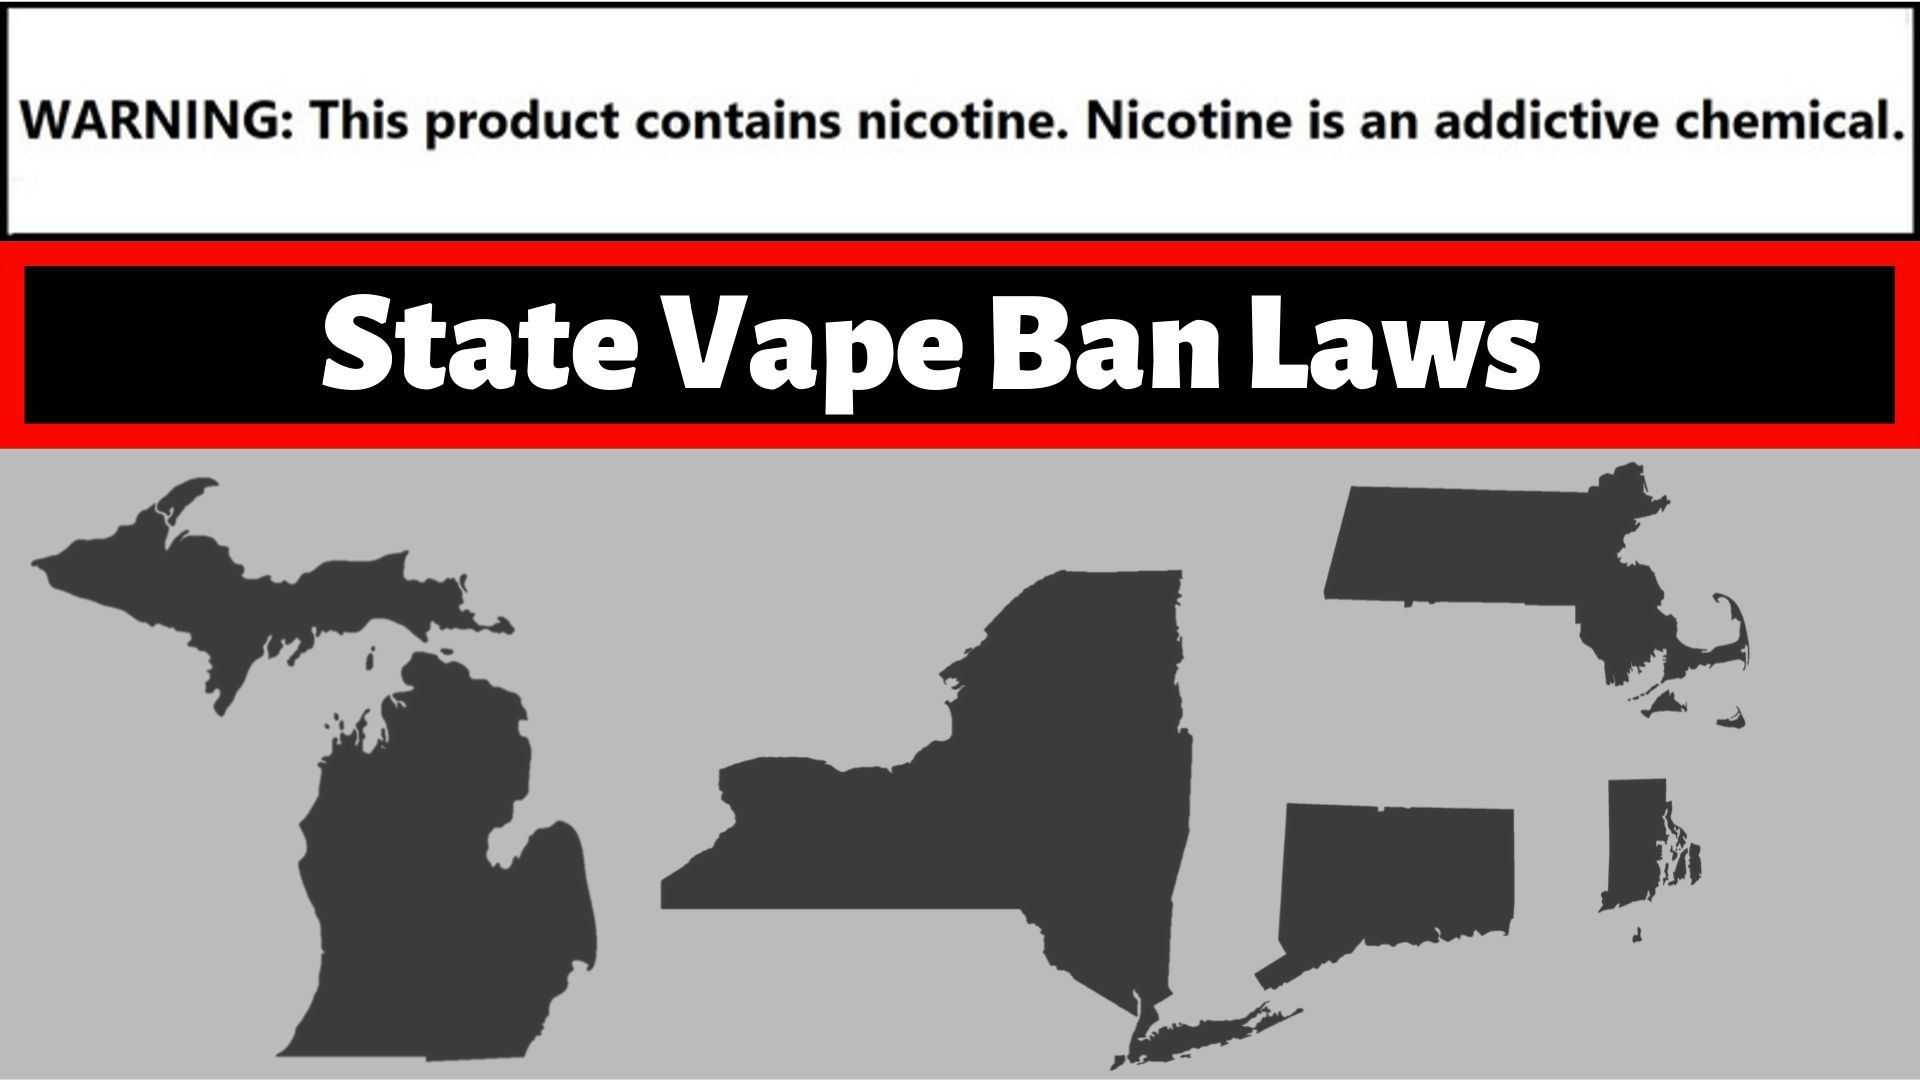 state vape ban laws 3.jpg